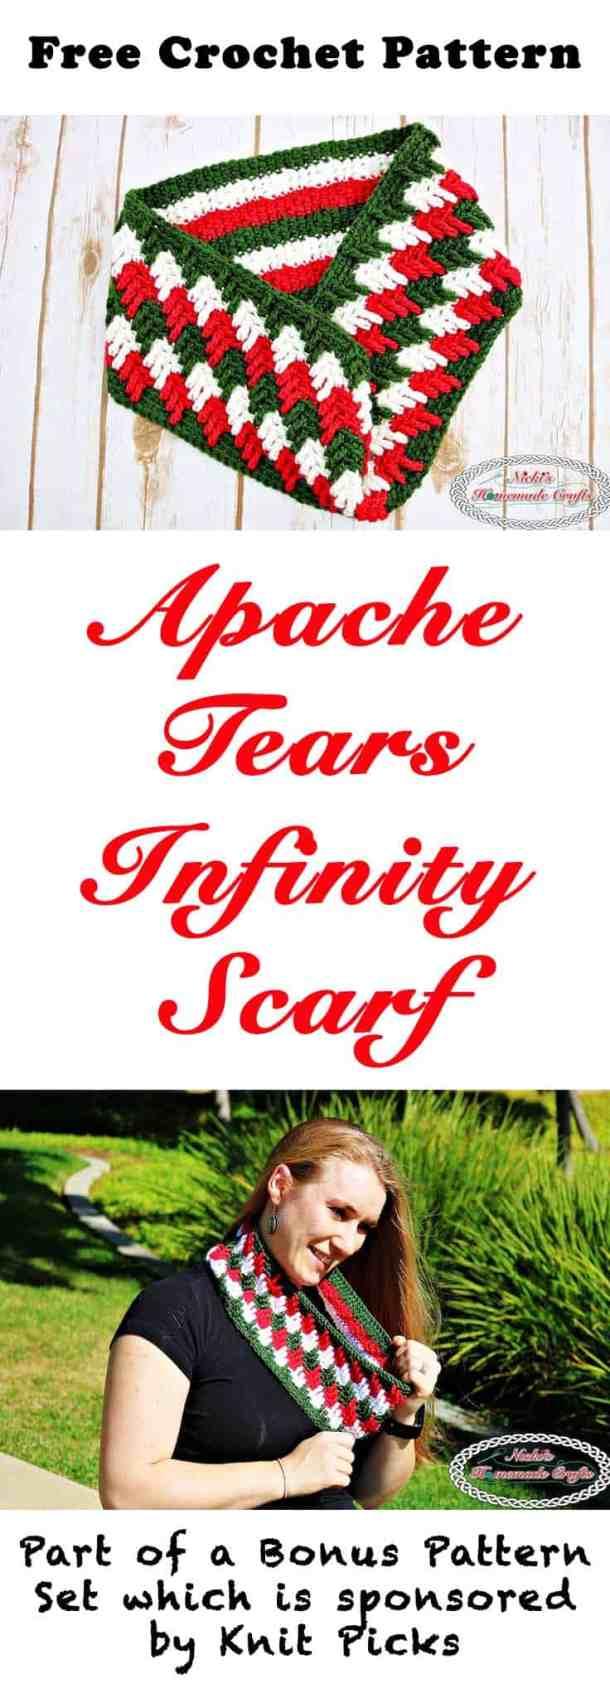 Apache Tears Infinity Scarf - Free Crochet Pattern by Nicki's Homemade Crafts #crochet #crochetalong #knitpicks #freecrochetpattern #infinityscarf #apachetears